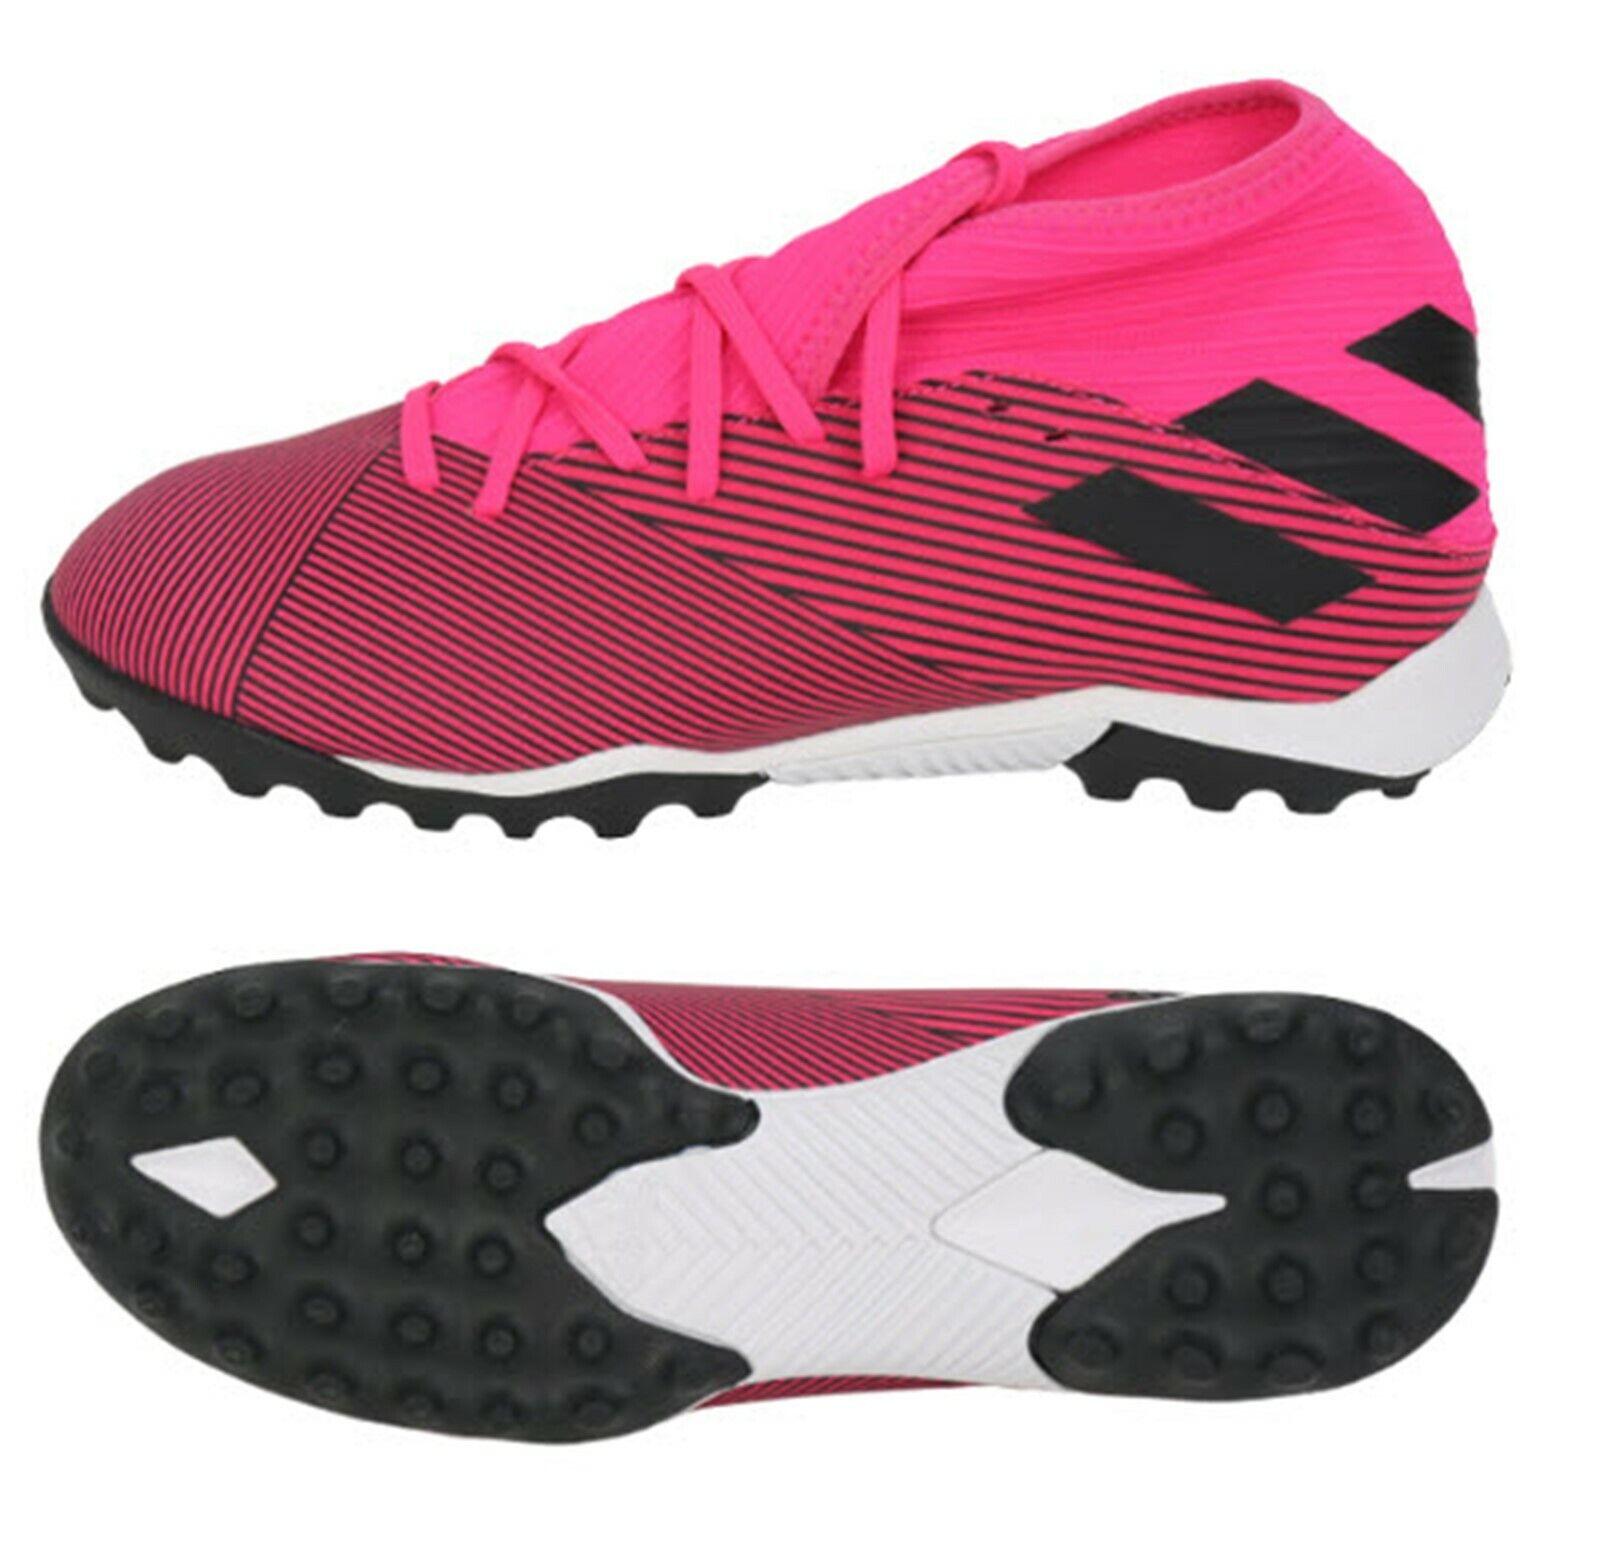 Adidas Hommes NEMEZIZ 19.3 TF Cleats Futsal rose Soccer chaussures bottes Spike F34426